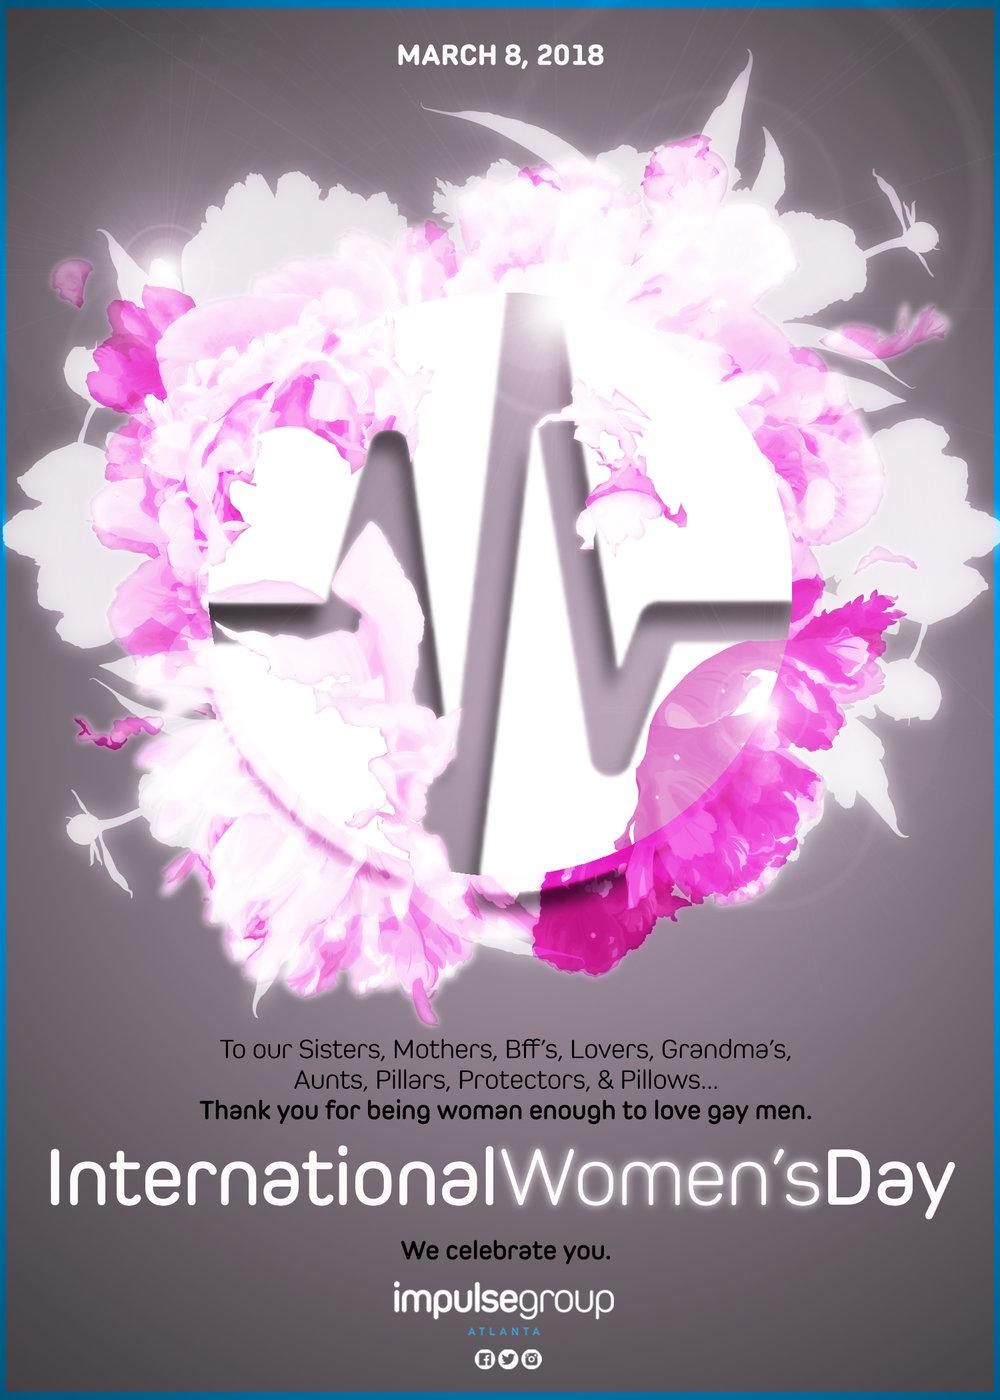 National Womens Day Image.jpg